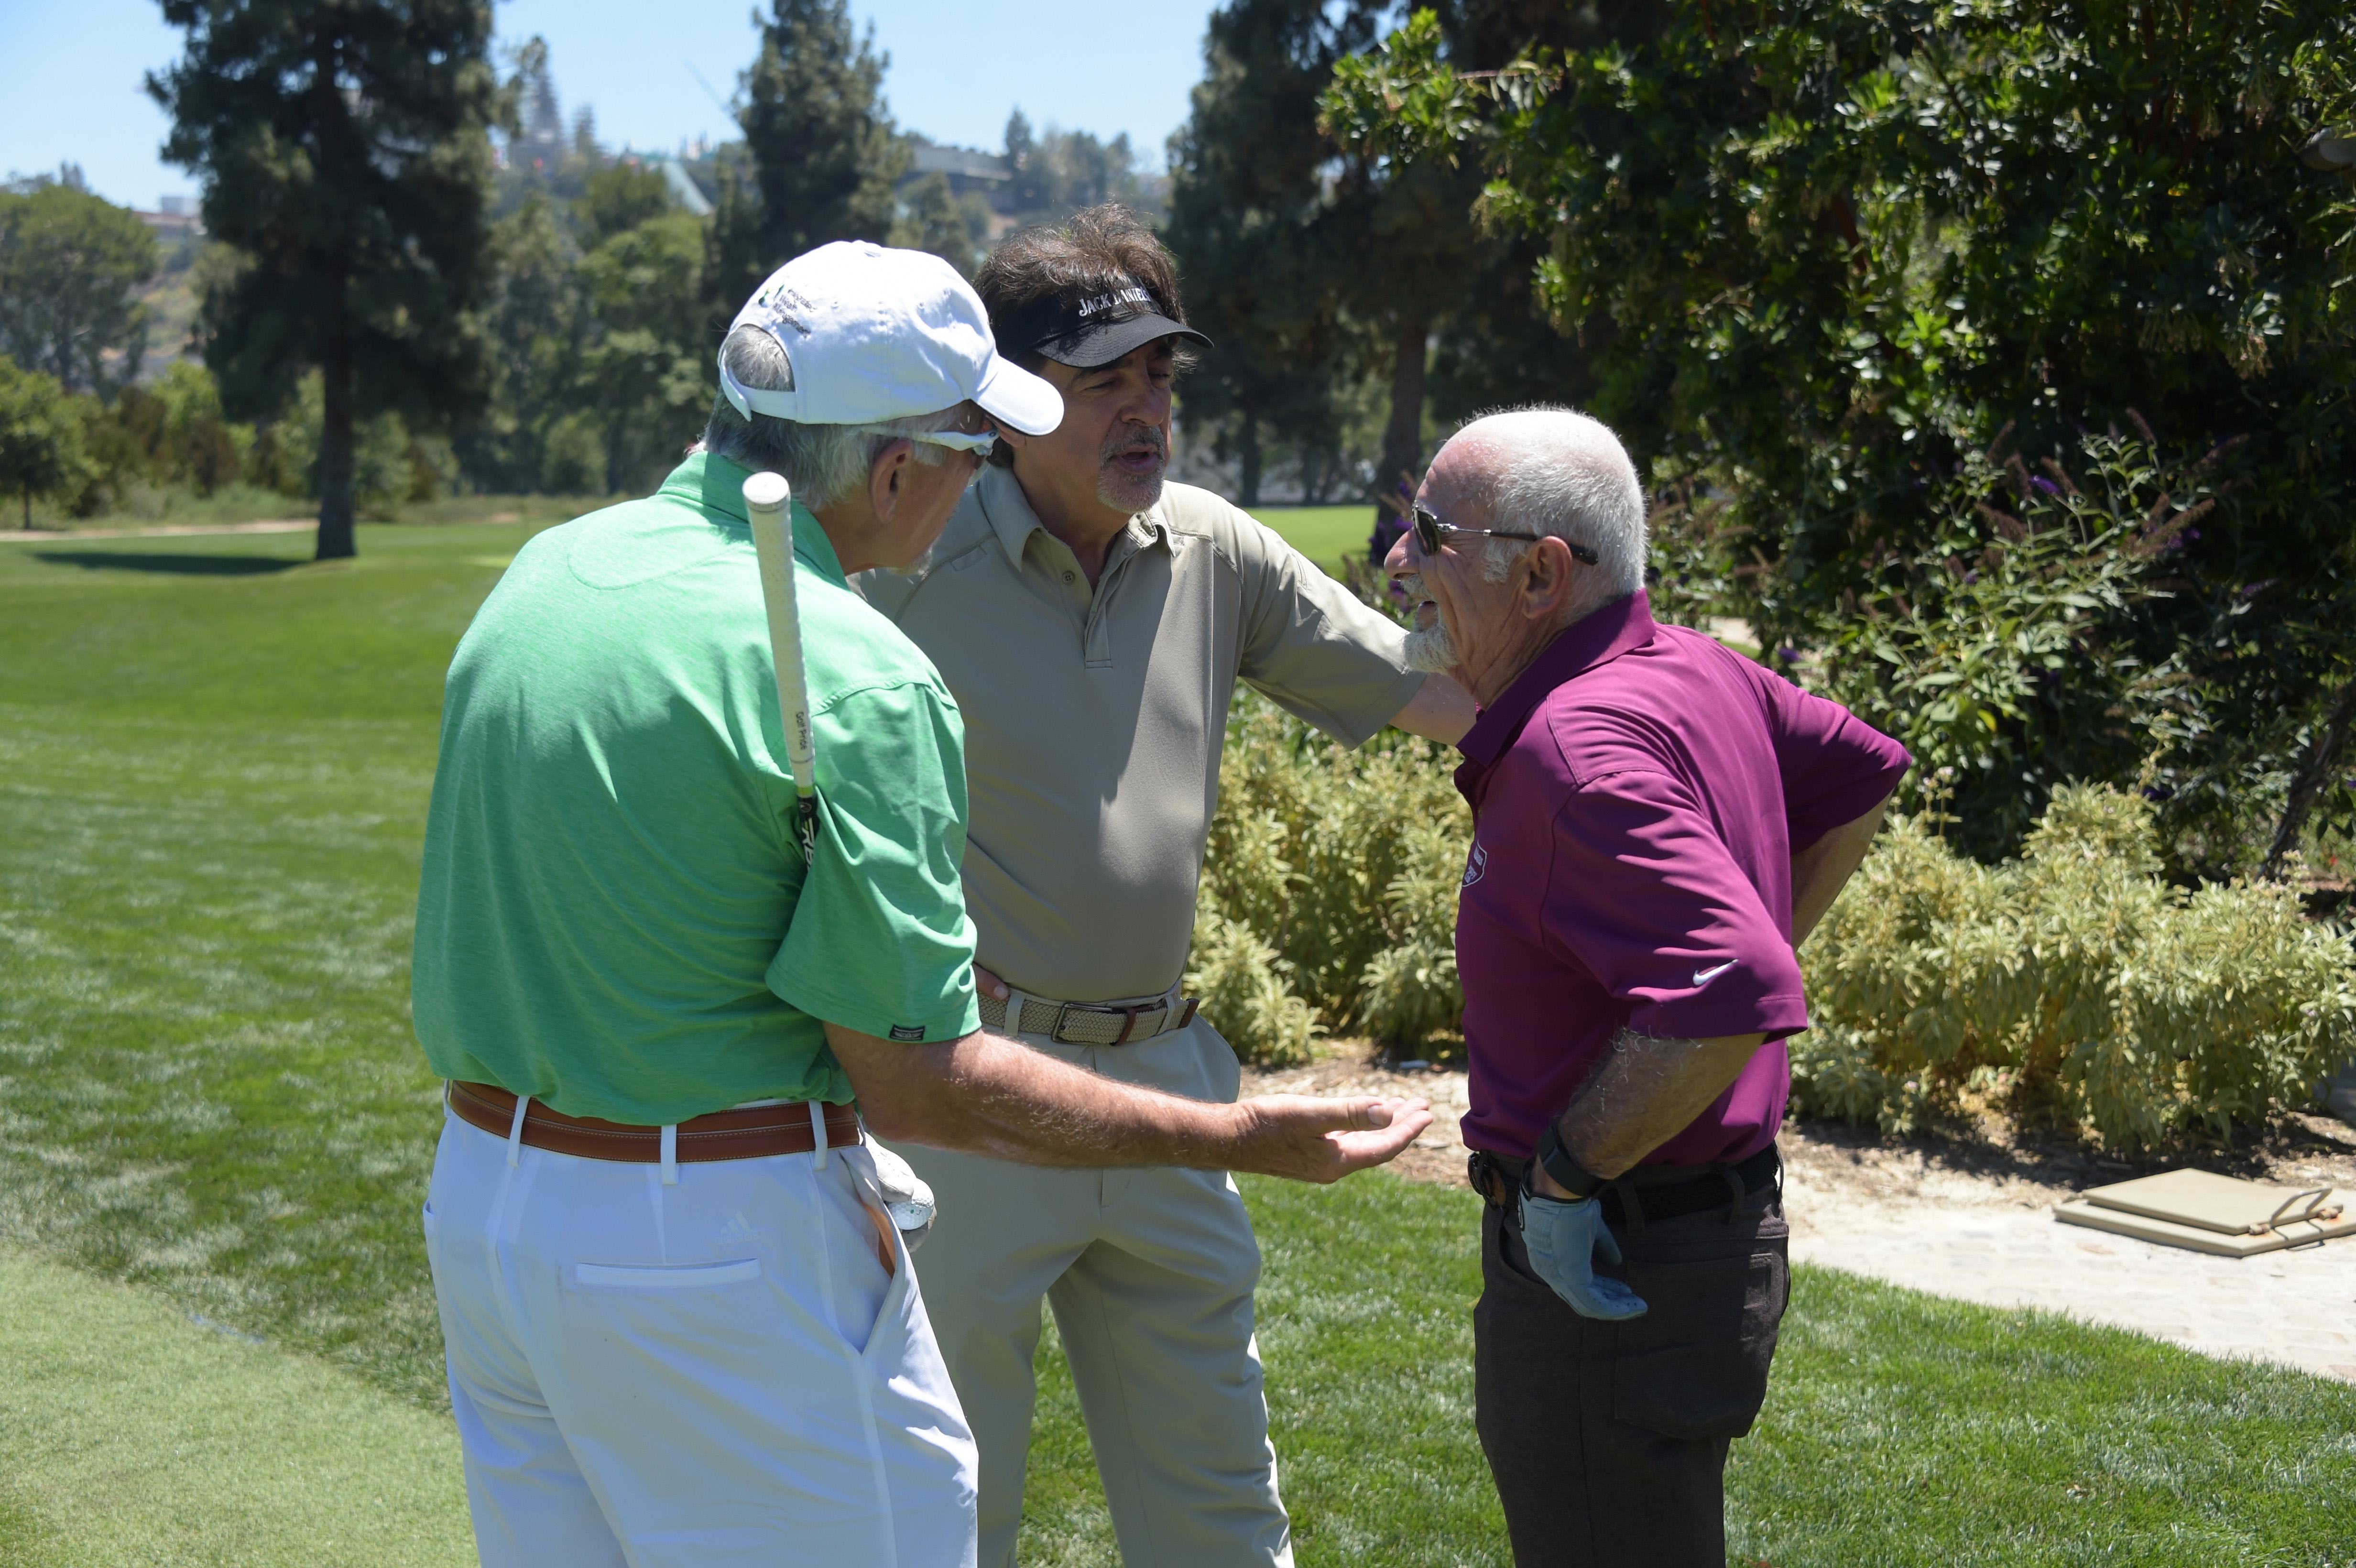 (L-R) Actors David Leisure, Joe Mantegna and Joe Pesci attend The Screen Actors Guild Foundation's 6th Annual Los Angeles Golf Classic on June 8, 2015 in Burbank, California.  (Photo by Jason Kempin/Getty Images for The Screen Actors Guild Foundation)